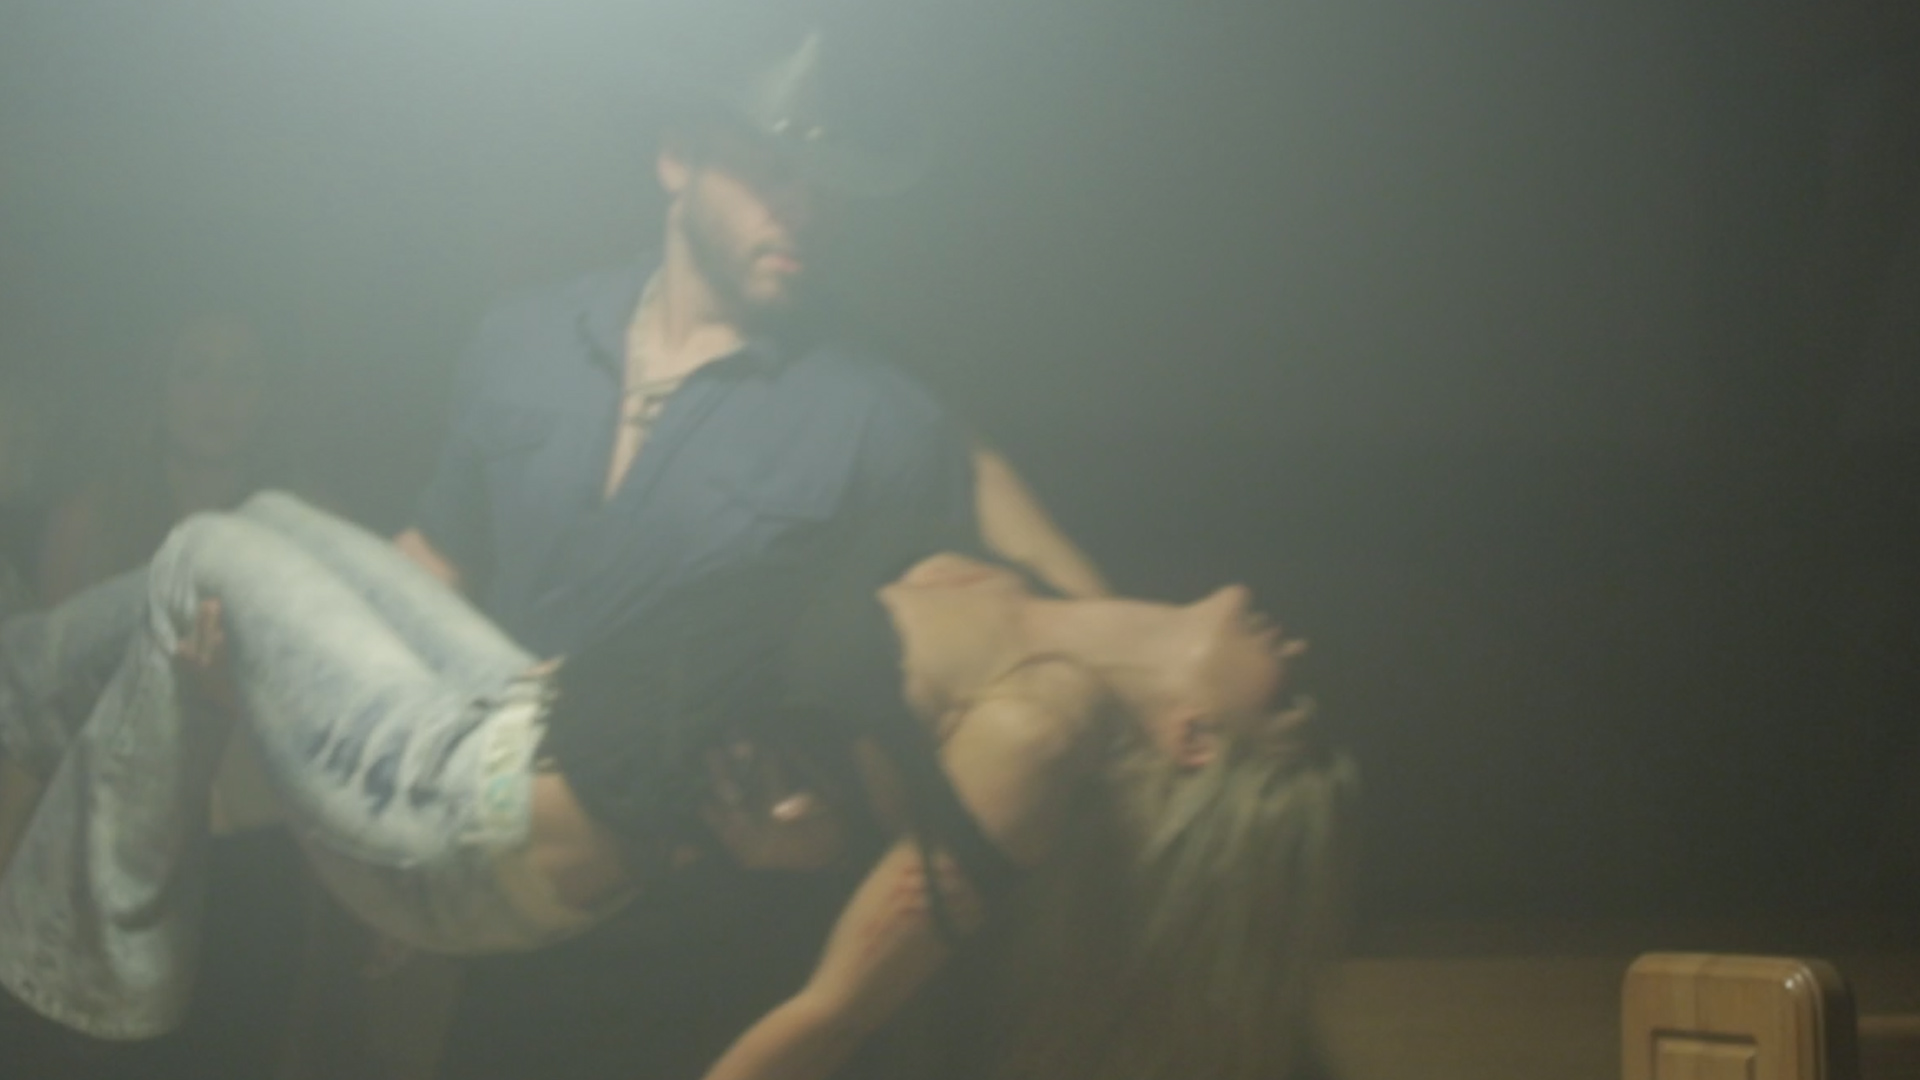 Dark Roads 79 - the climactic scene in the film: Grace is hurt!